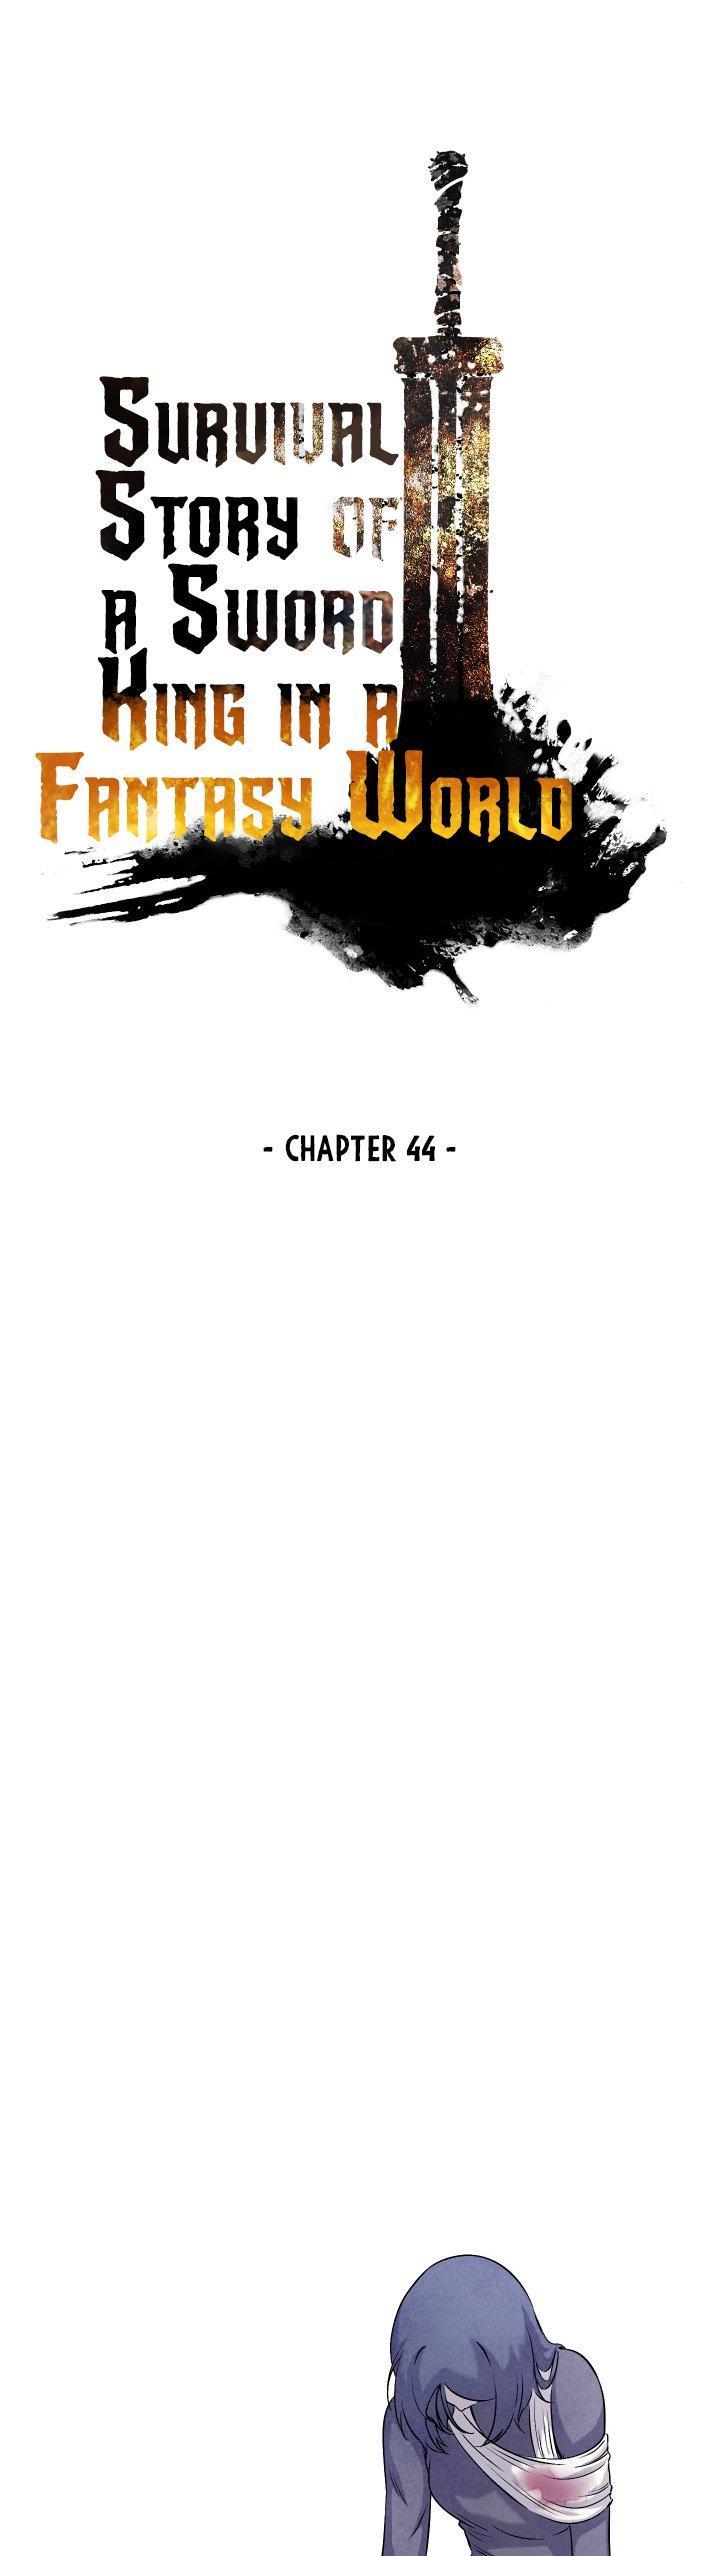 Survival Story Of A Sword King In A Fantasy World Chapter 44 page 63 - Mangakakalots.com